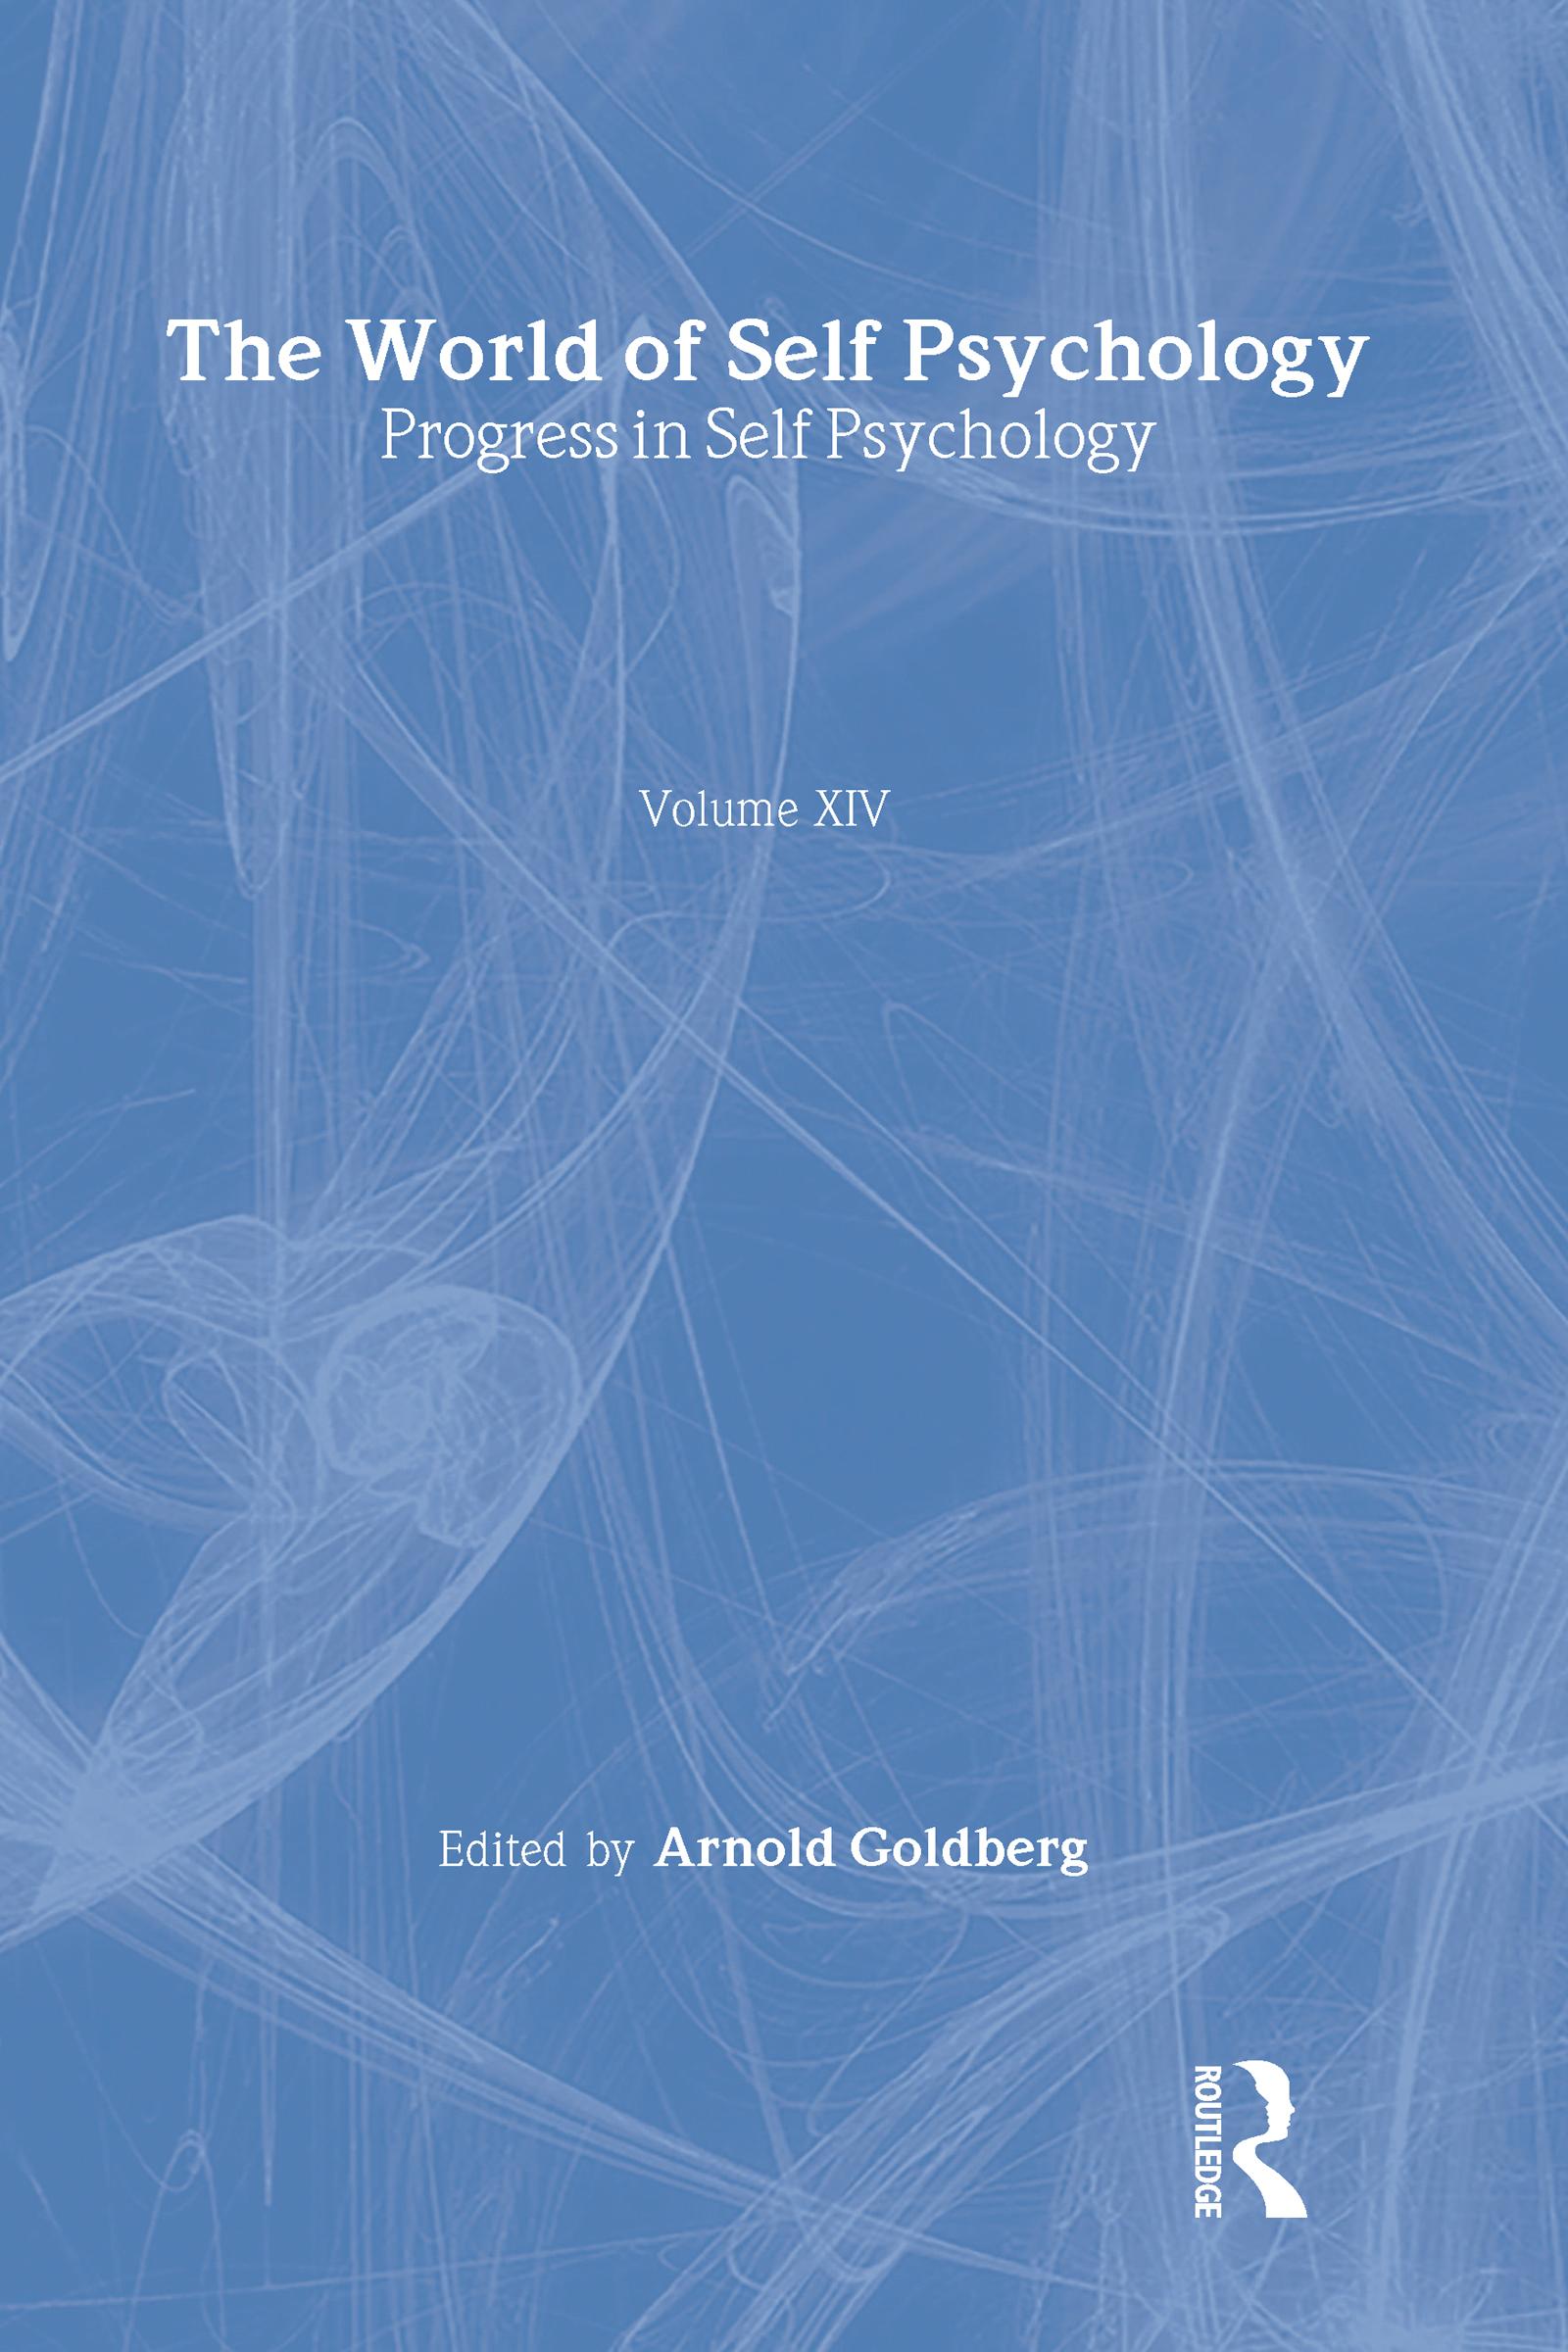 Progress in Self Psychology, V. 14: The World of Self Psychology (Hardback) book cover